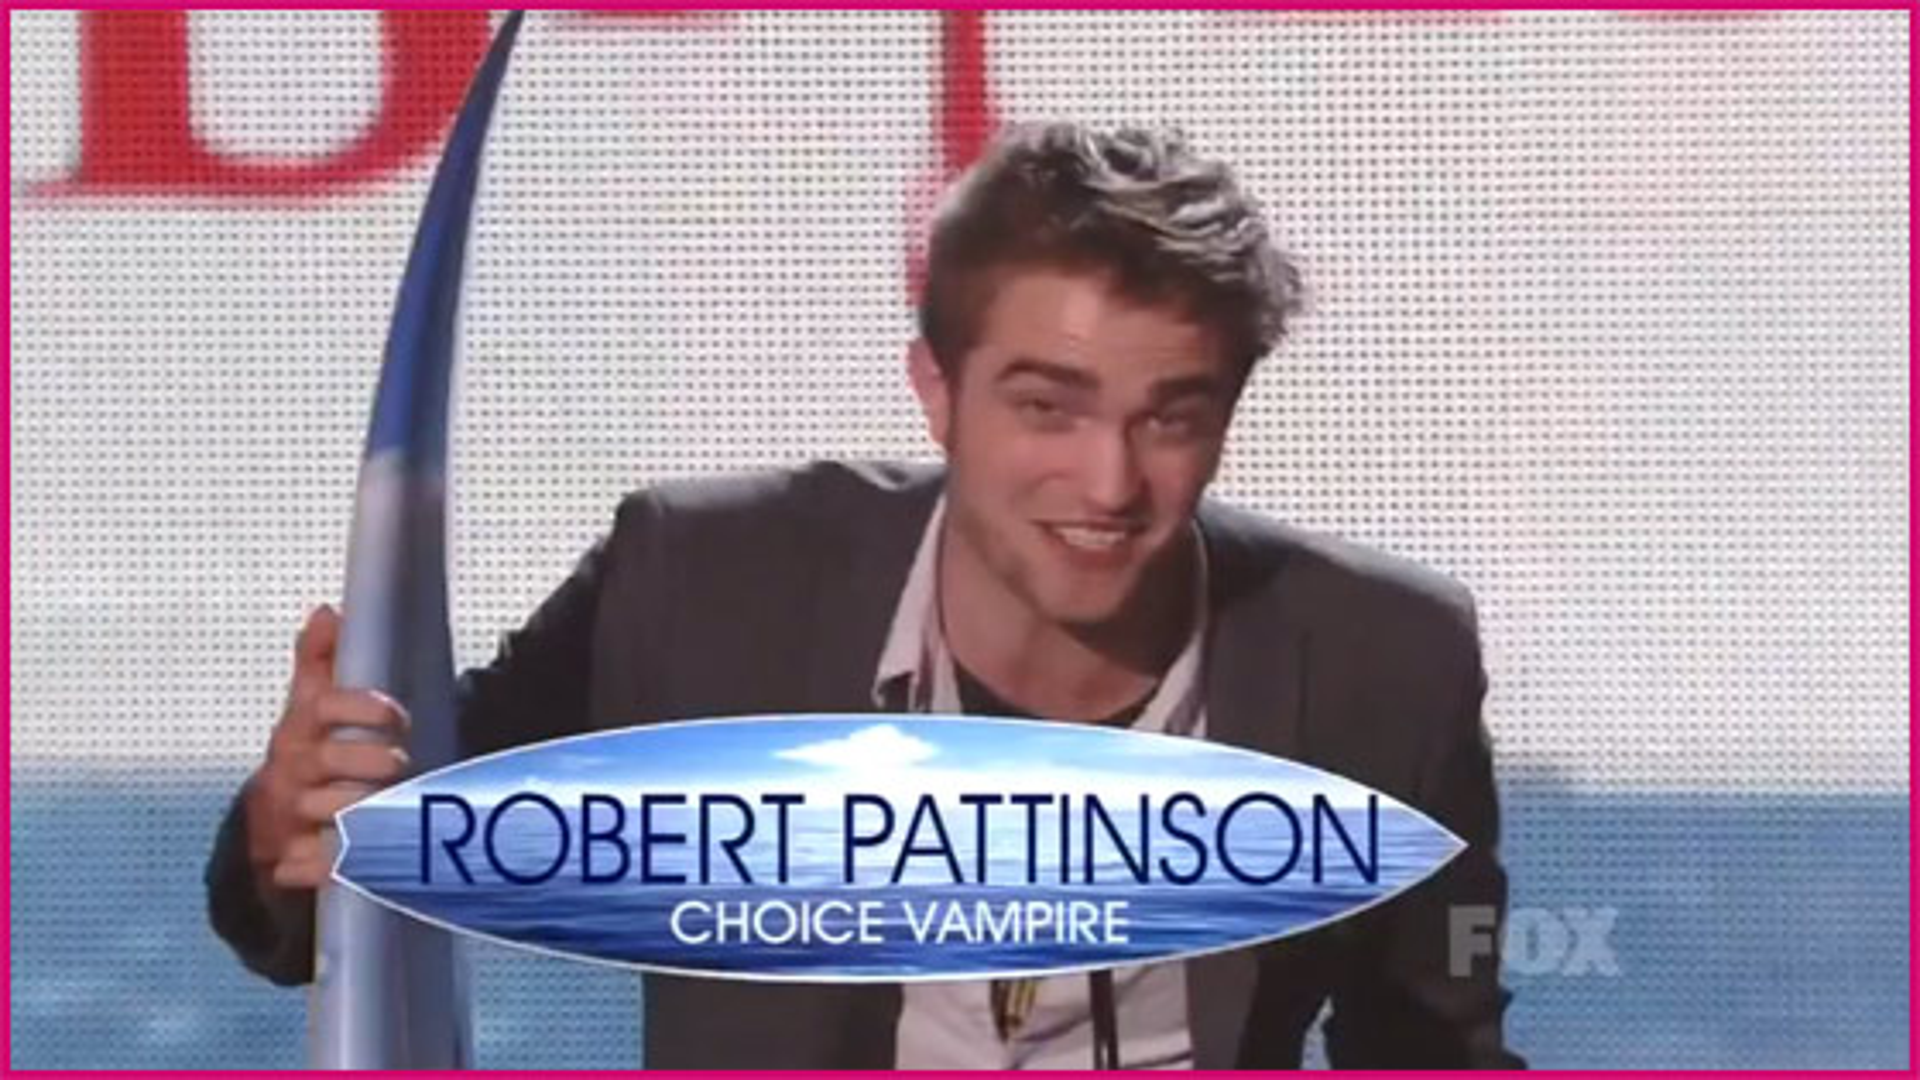 Robert-Pattinson-Teen-Choice-Awards-2011-Choice-Vampire